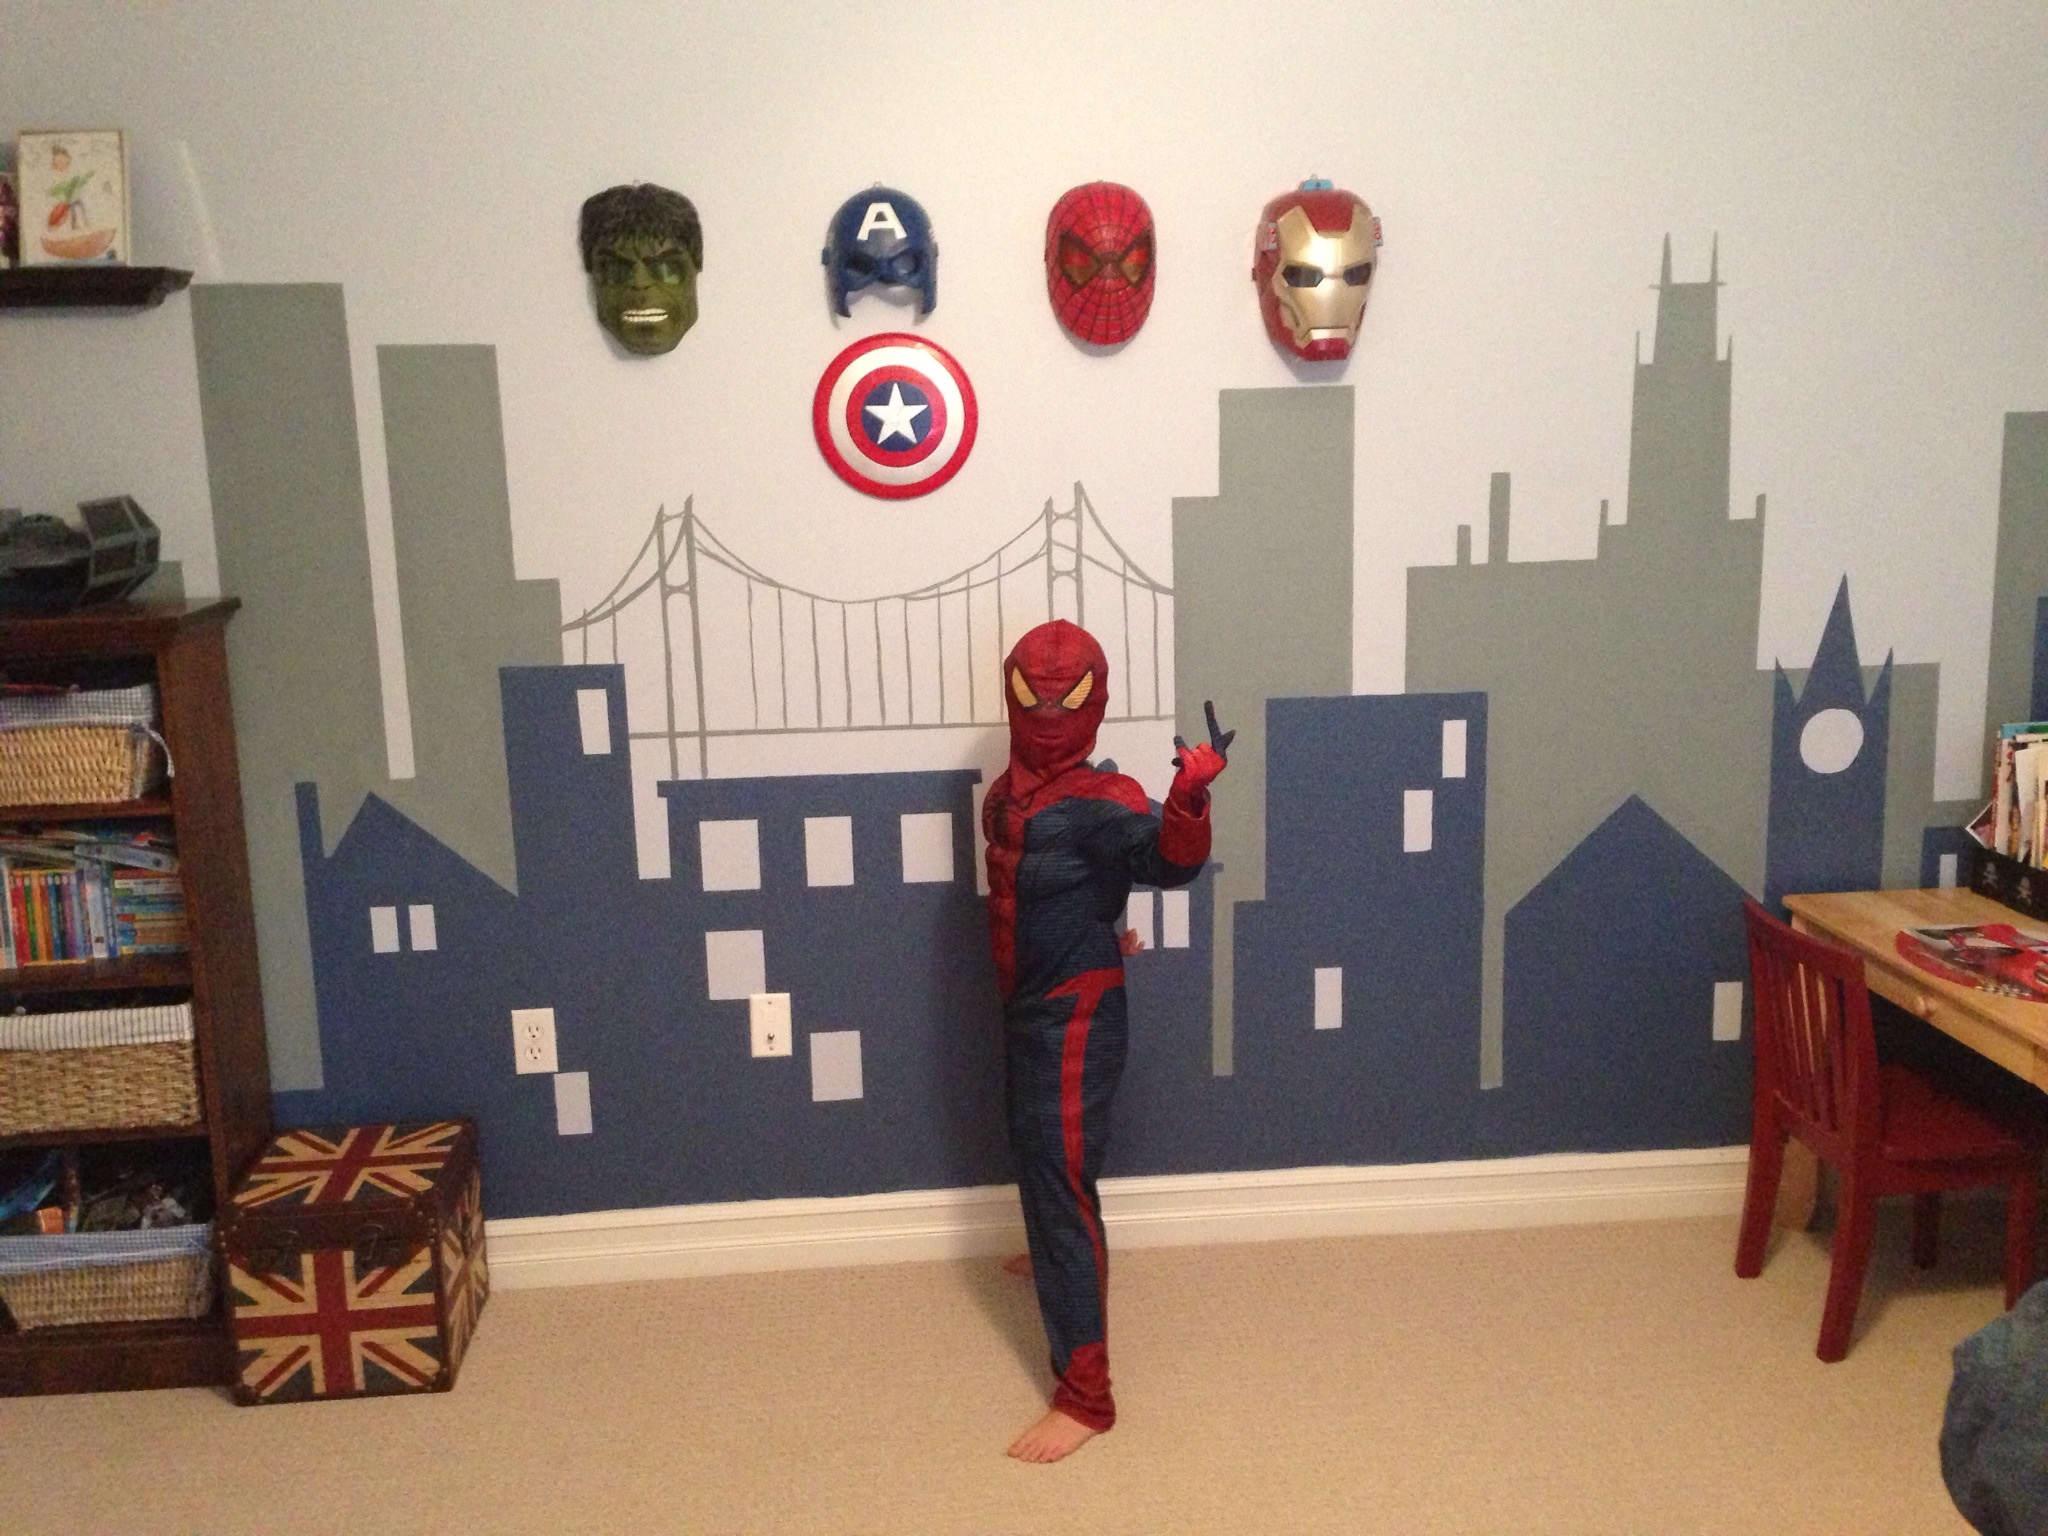 Avenger Room Wall Decor , HD Wallpaper & Backgrounds